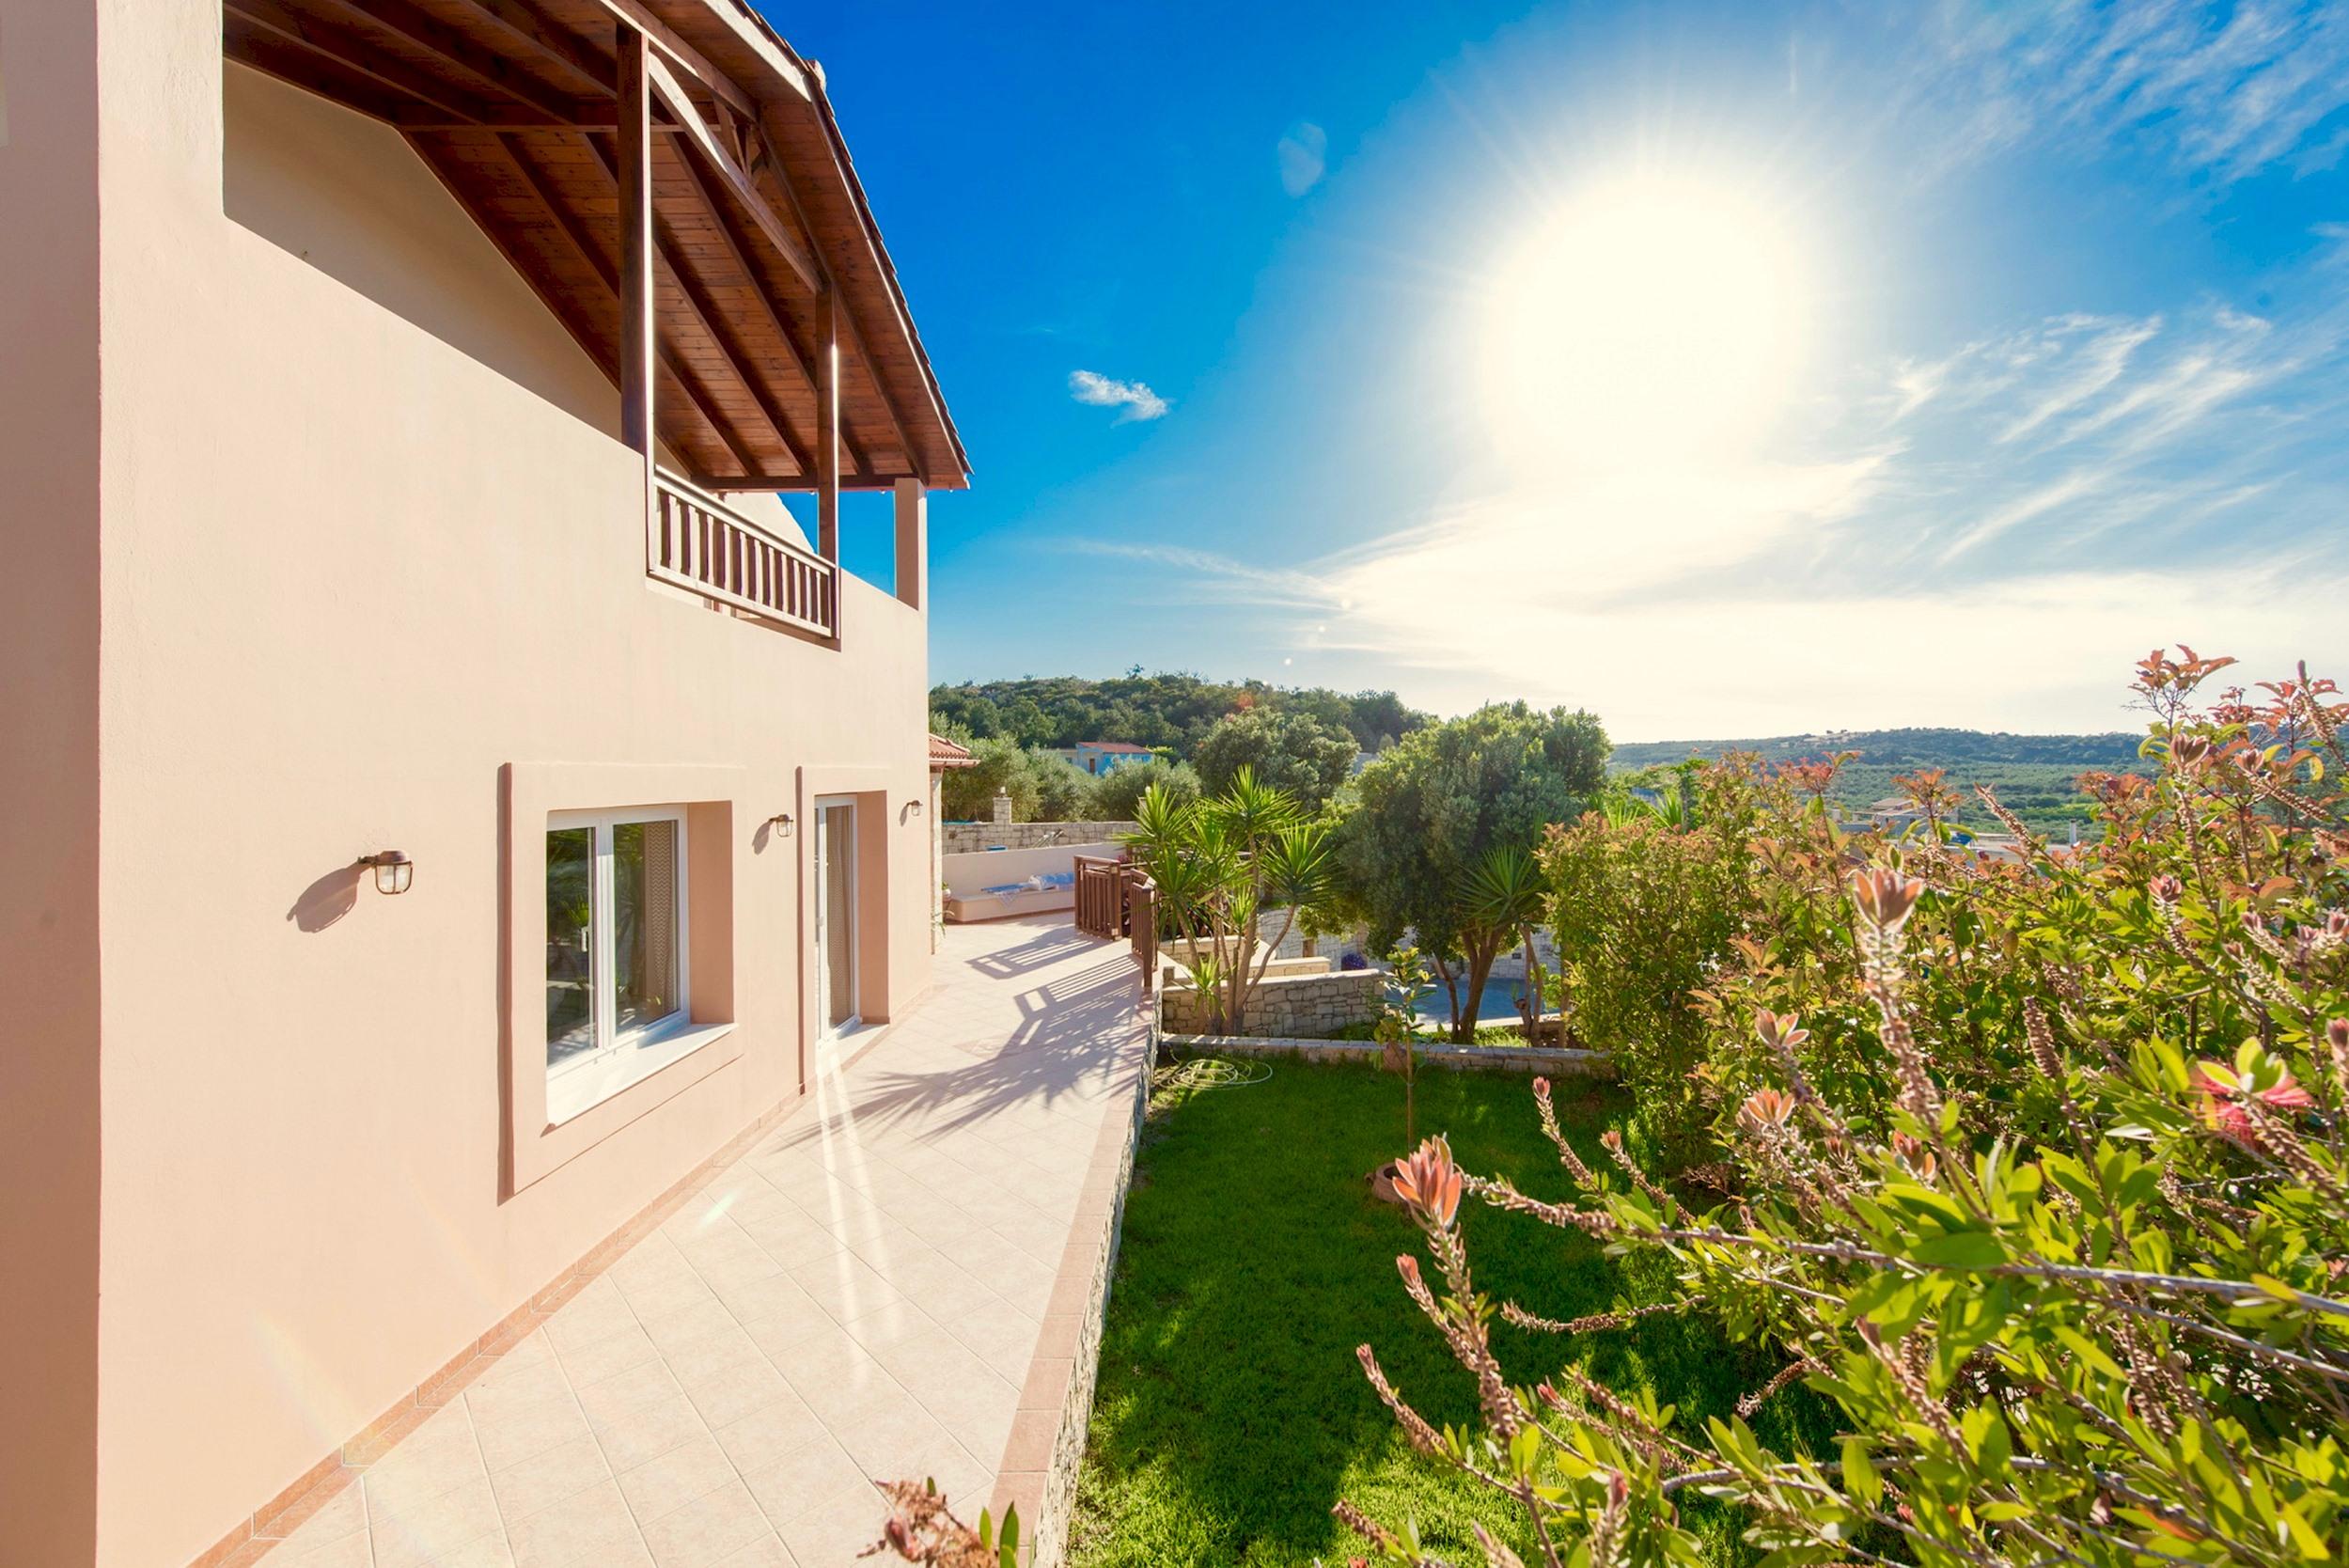 Ferienhaus Luxury Villa Korini with private swimming pool (2470495), Roumeli, Kreta Nordküste, Kreta, Griechenland, Bild 20